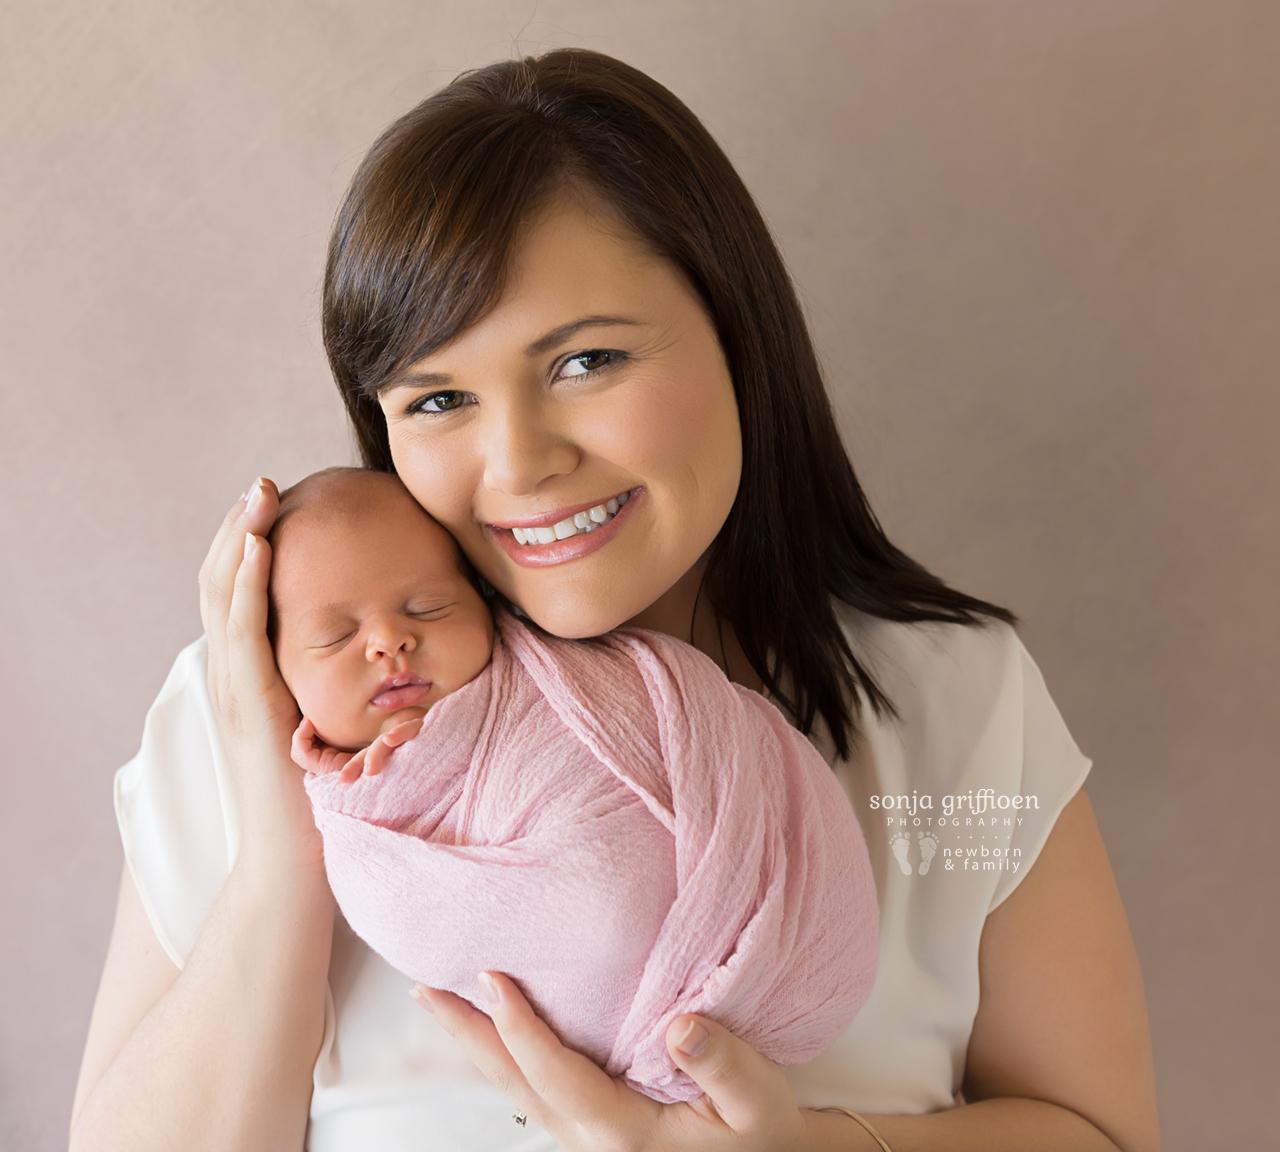 Lilly-Newborn-Brisbane-Newborn-Photographer-Sonja-Griffioen-16.jpg